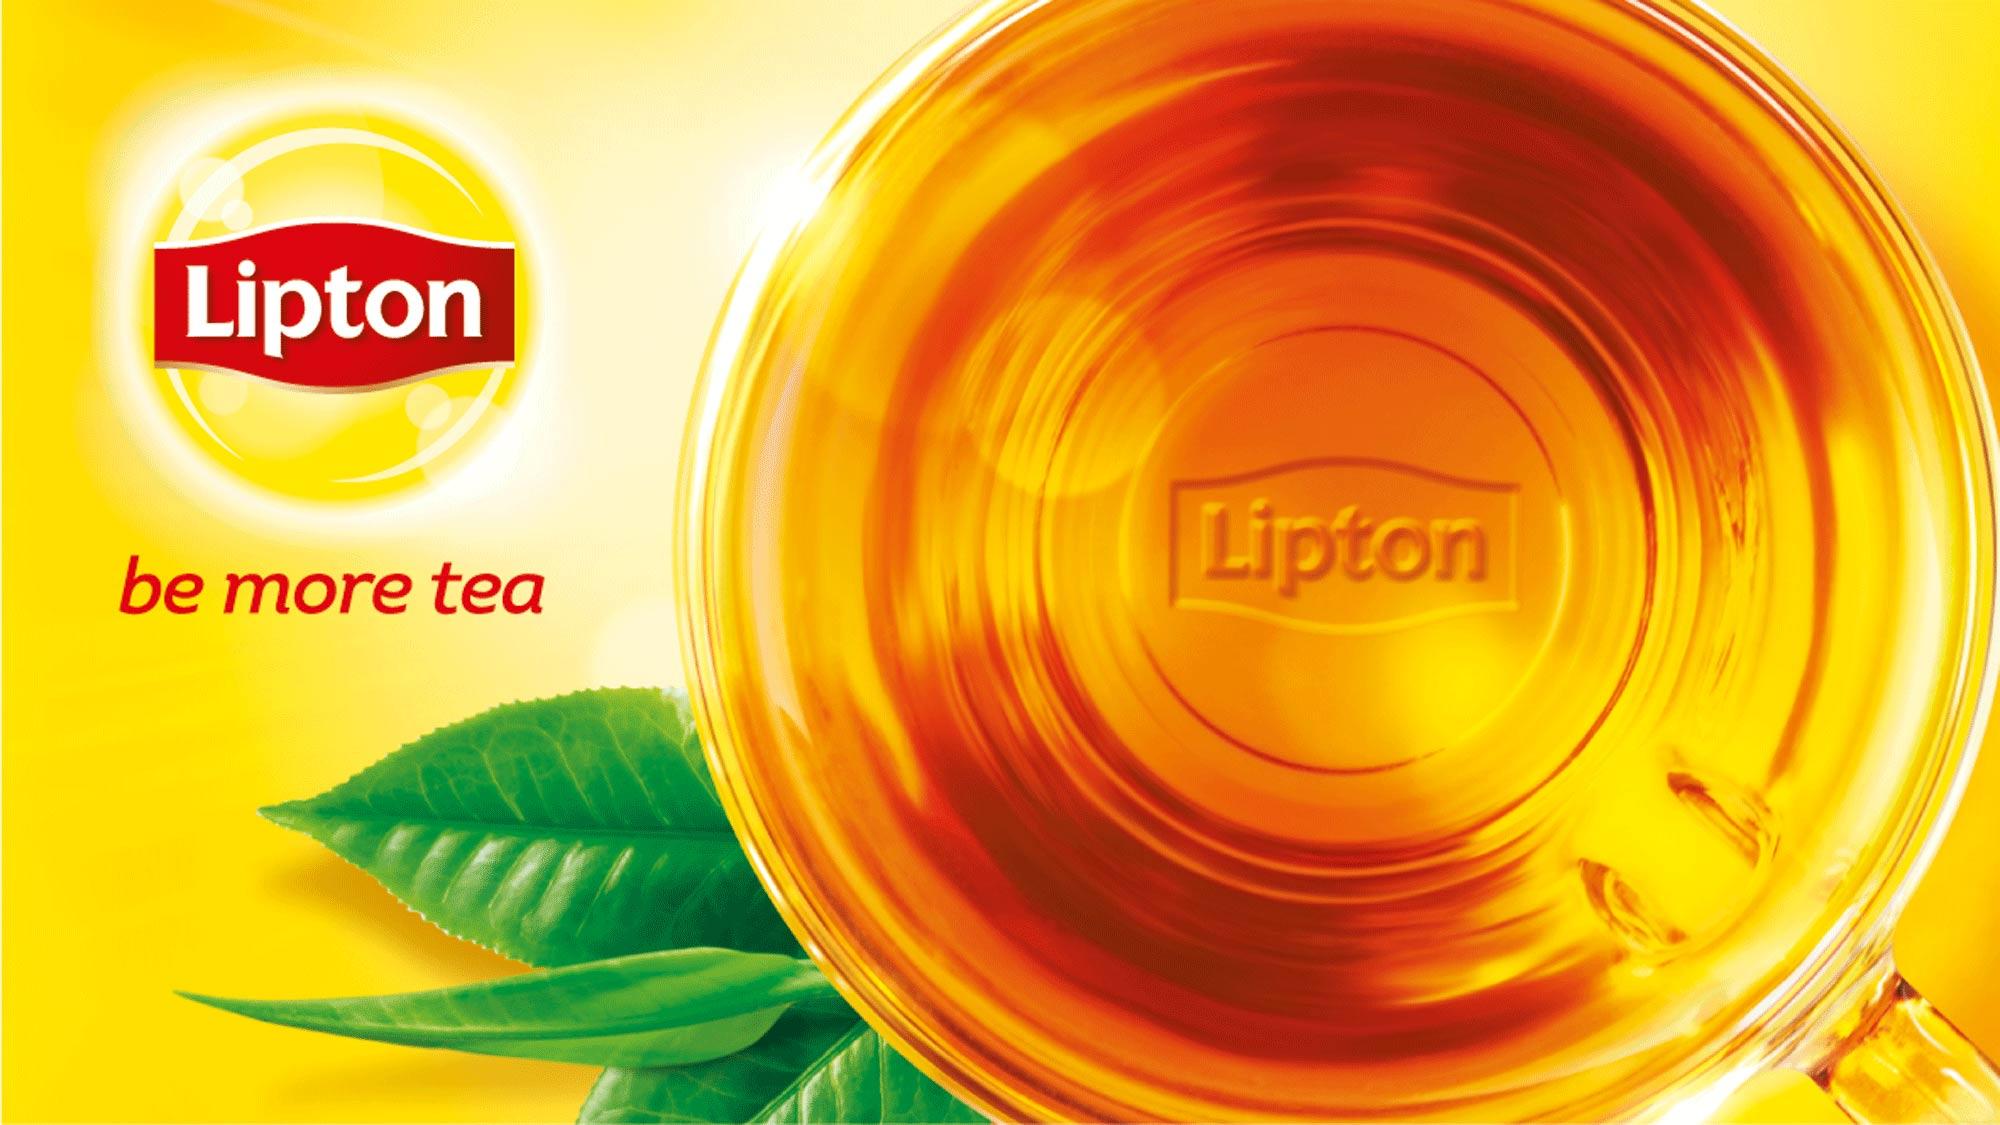 Lipton.